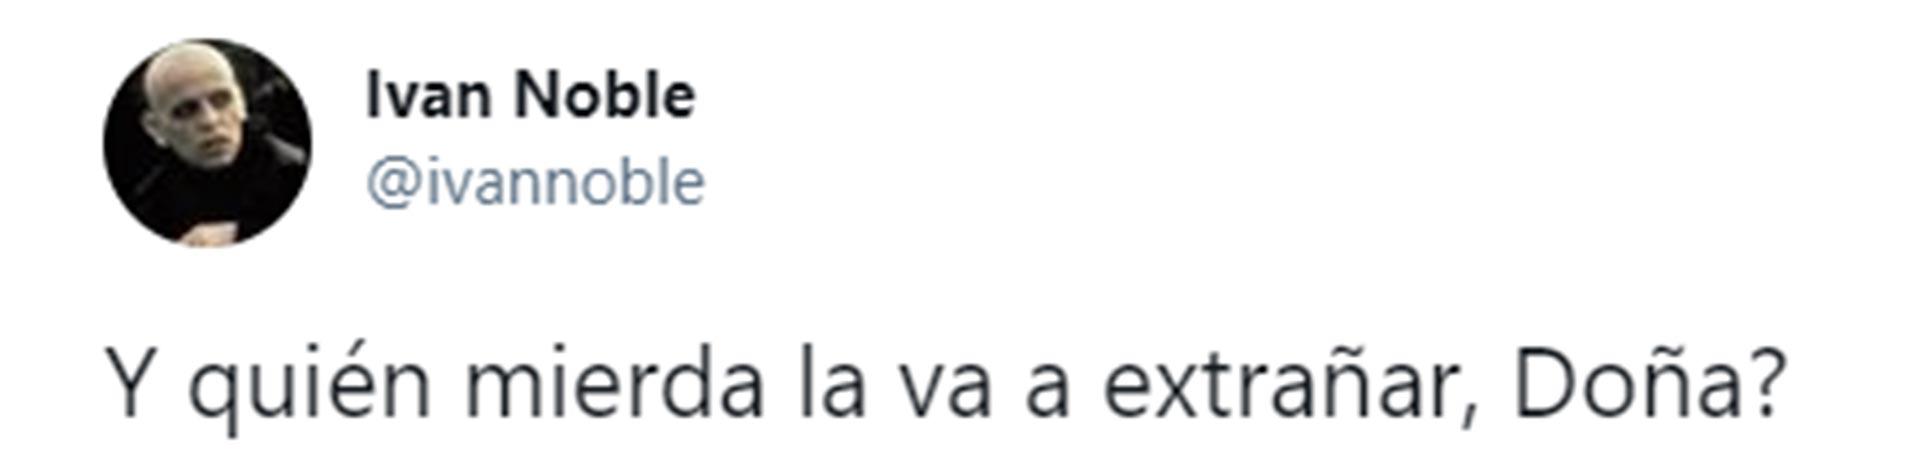 El mensaje de Iván Noble contra Susana Giménez